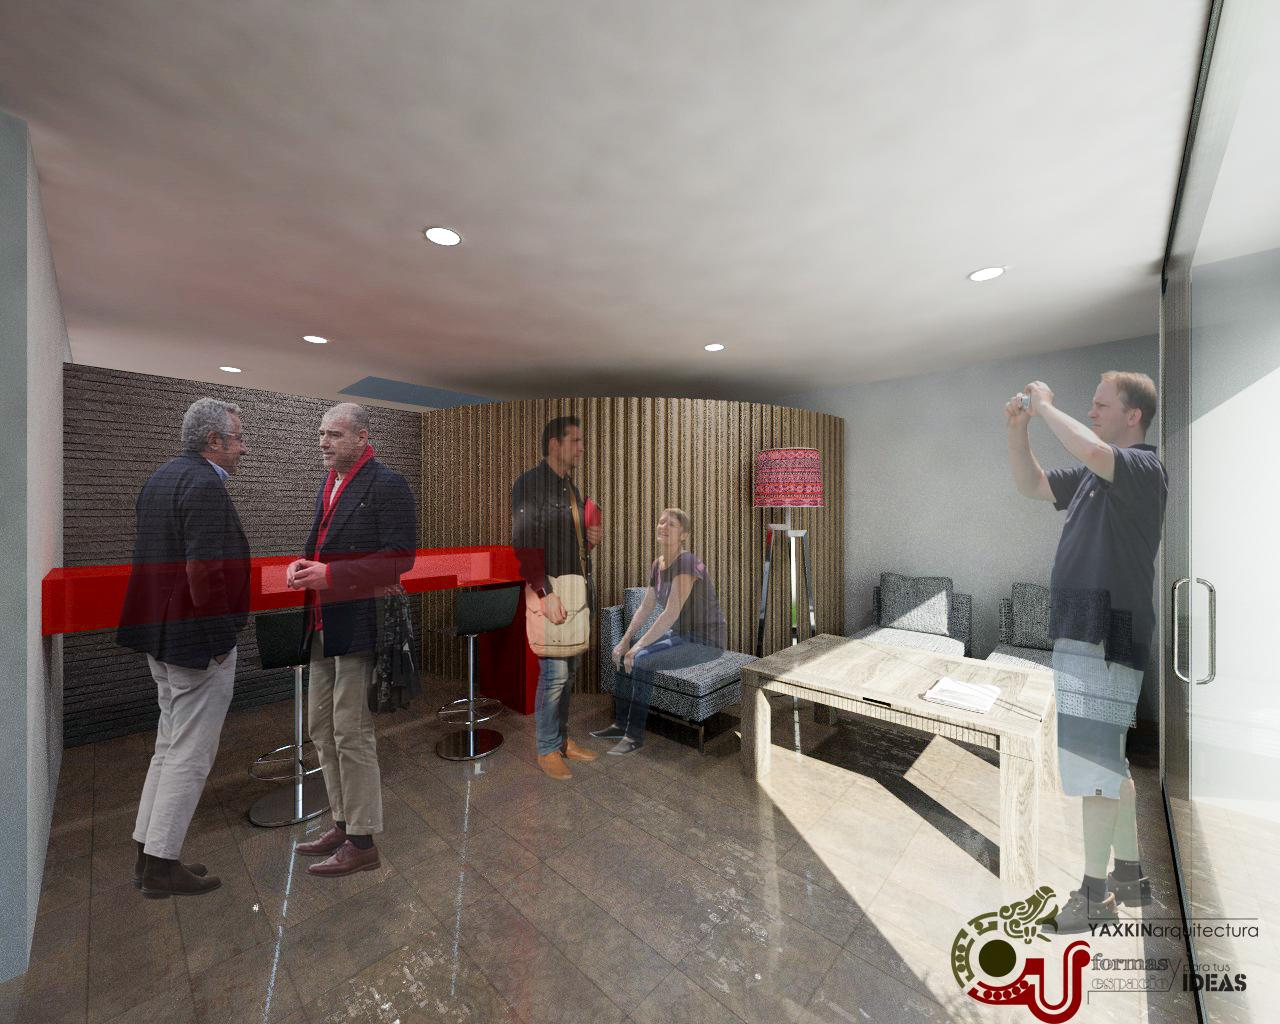 #YAXKIN_arquitectura #proyecto #hostal #sclc #chiapas